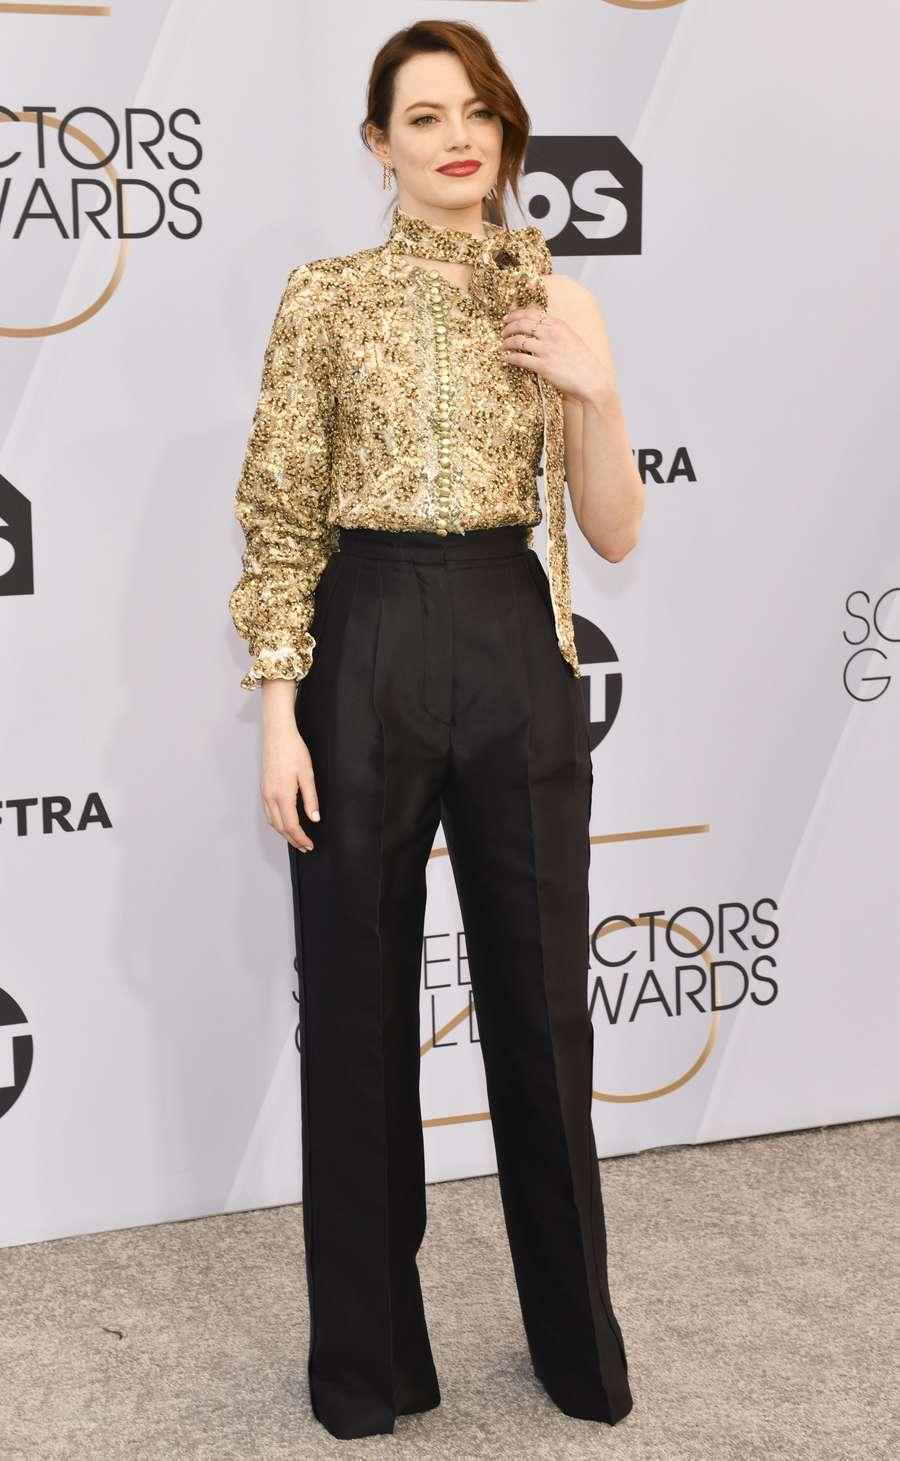 Emma Stone Bergaya Asimetris